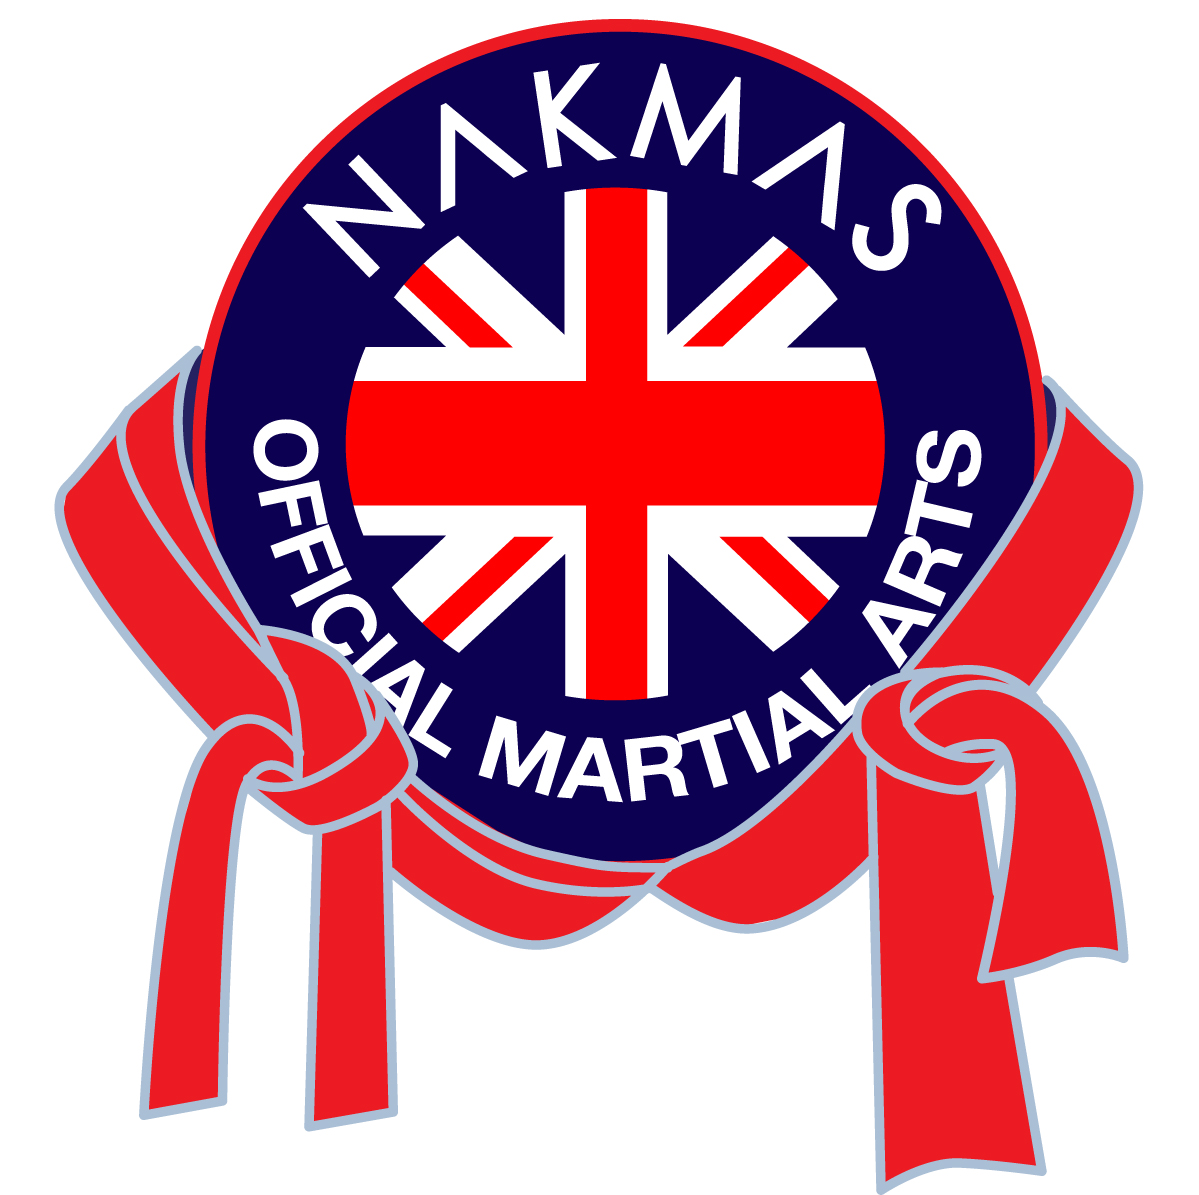 NAKMAS Official Martial Arts